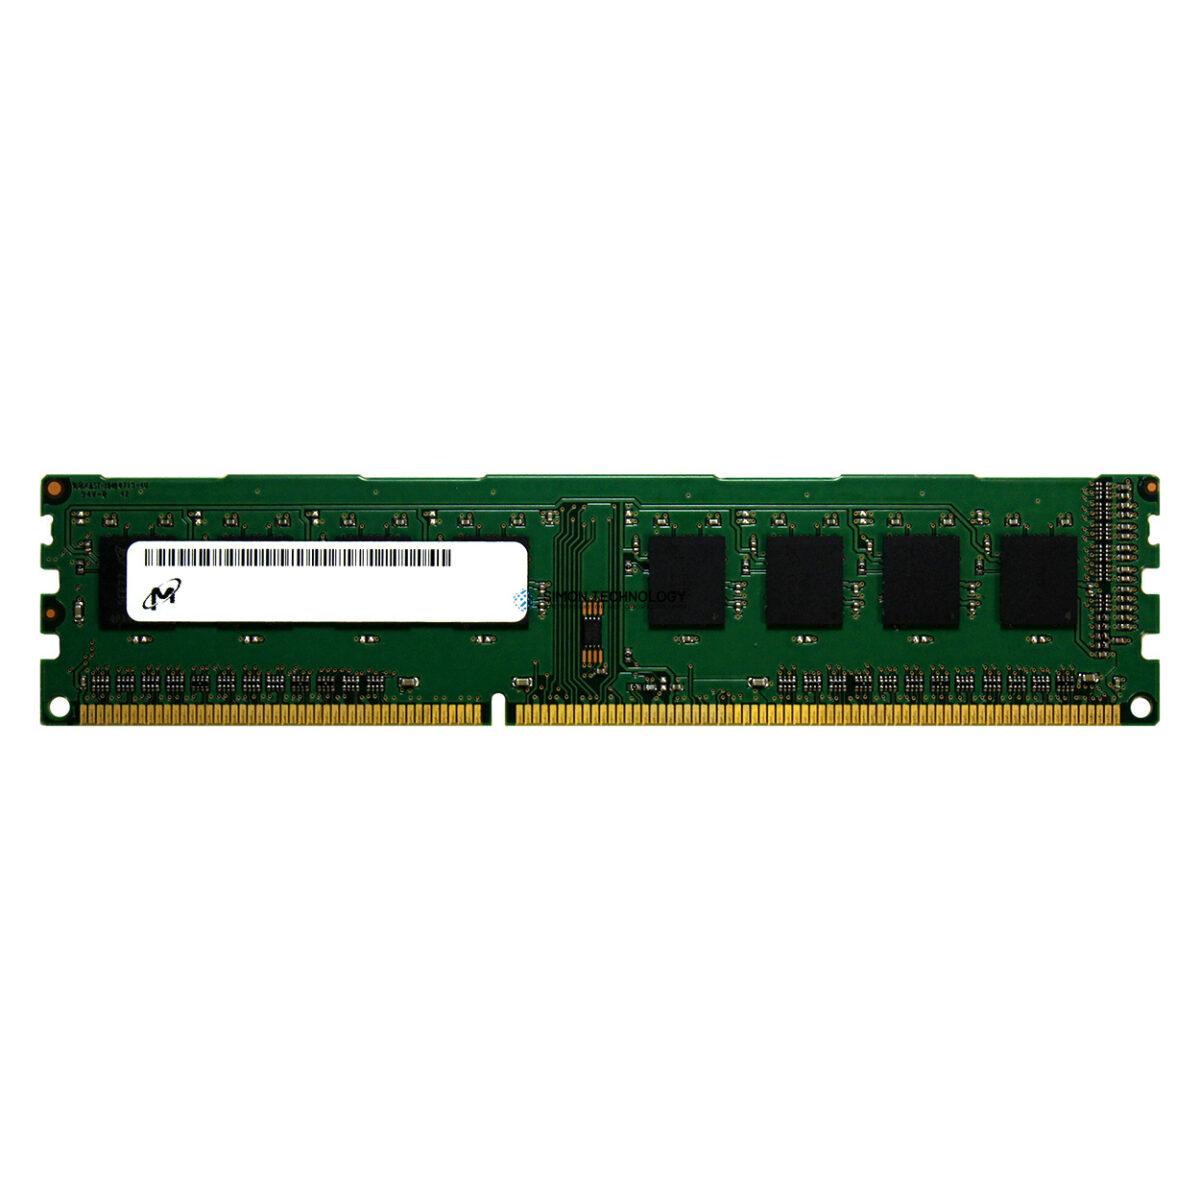 Оперативная память Micron MICRON 2GB (1*2GB) 1RX8 PC3L-10600R-9 DDR3-1333MHZ MEMORY (WH190)